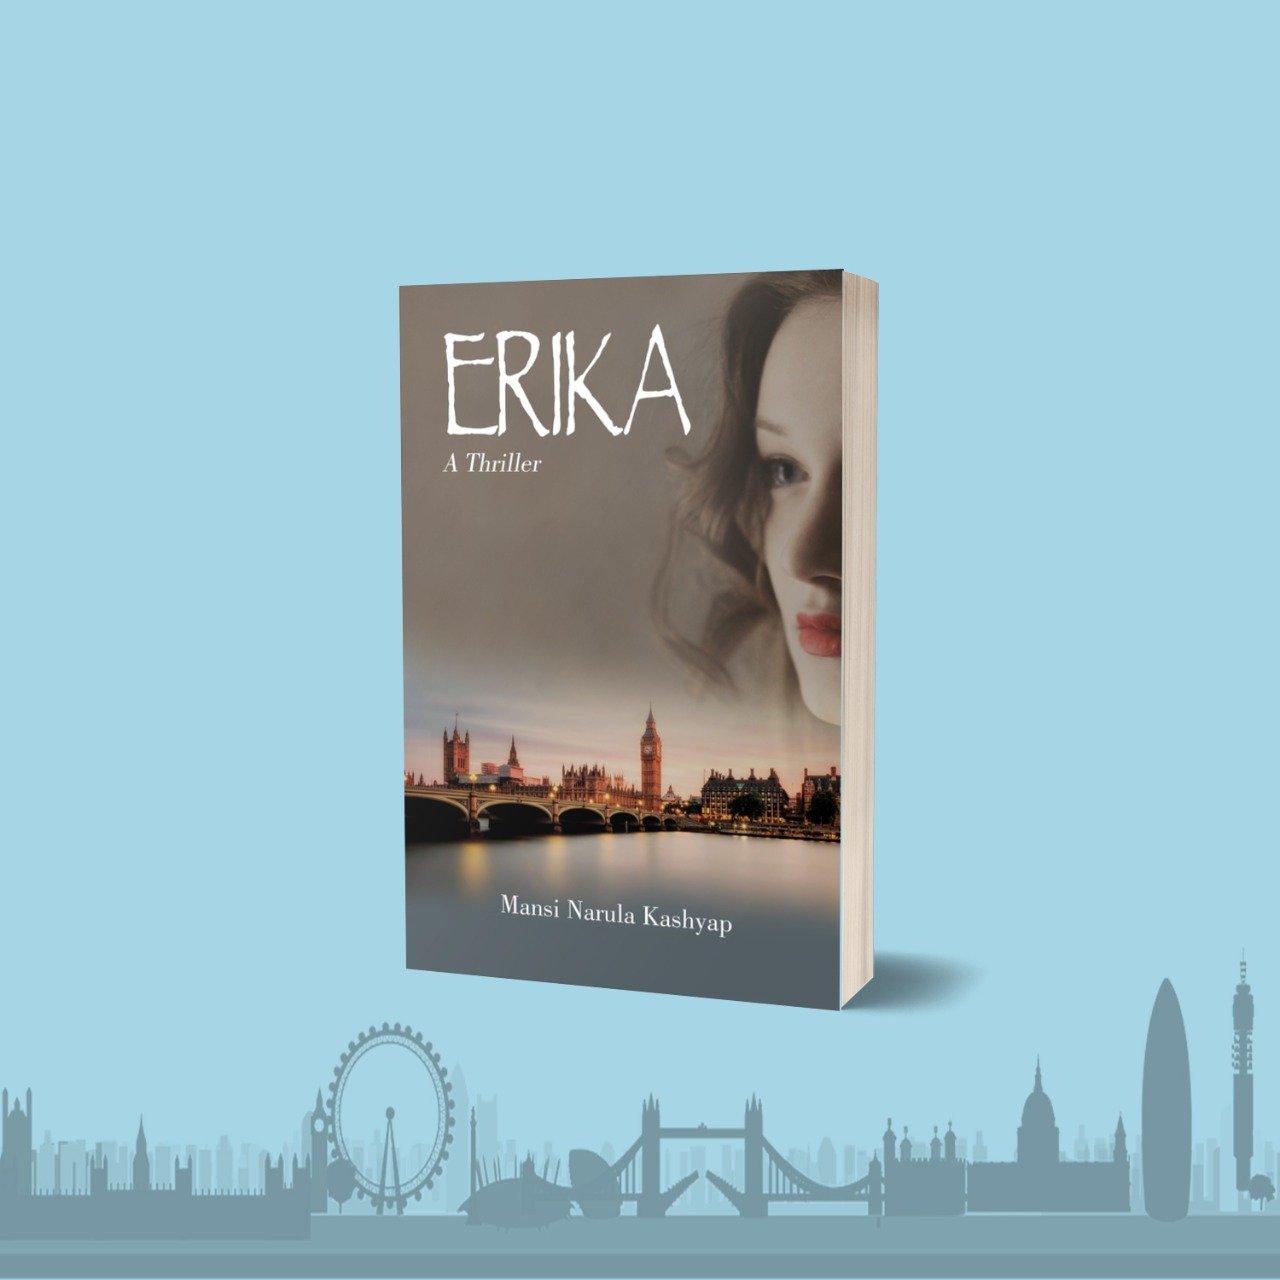 Erika: A Thriller